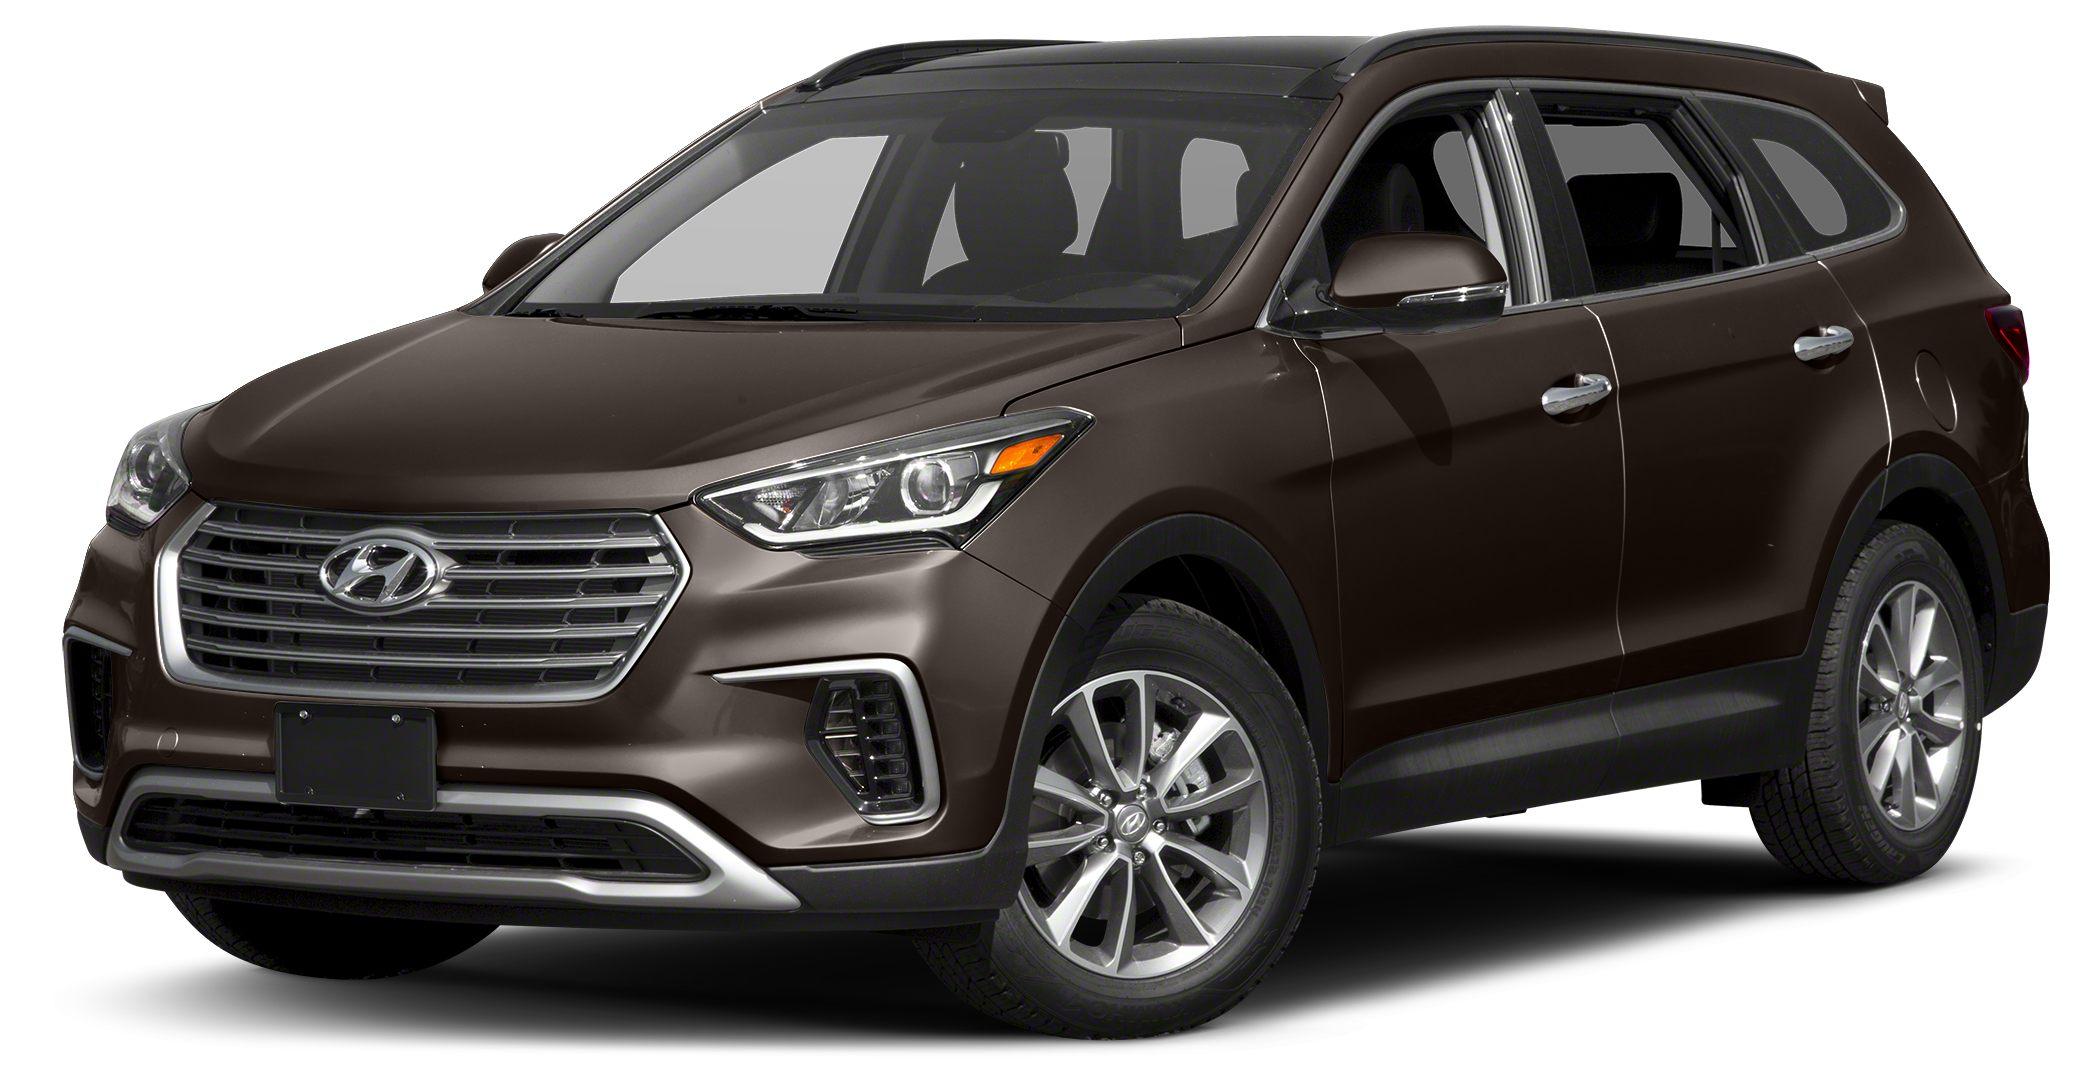 2017 Hyundai Santa Fe SE Miles 40429Color Java Espresso Stock U2423 VIN KM8SMDHF1HU181221